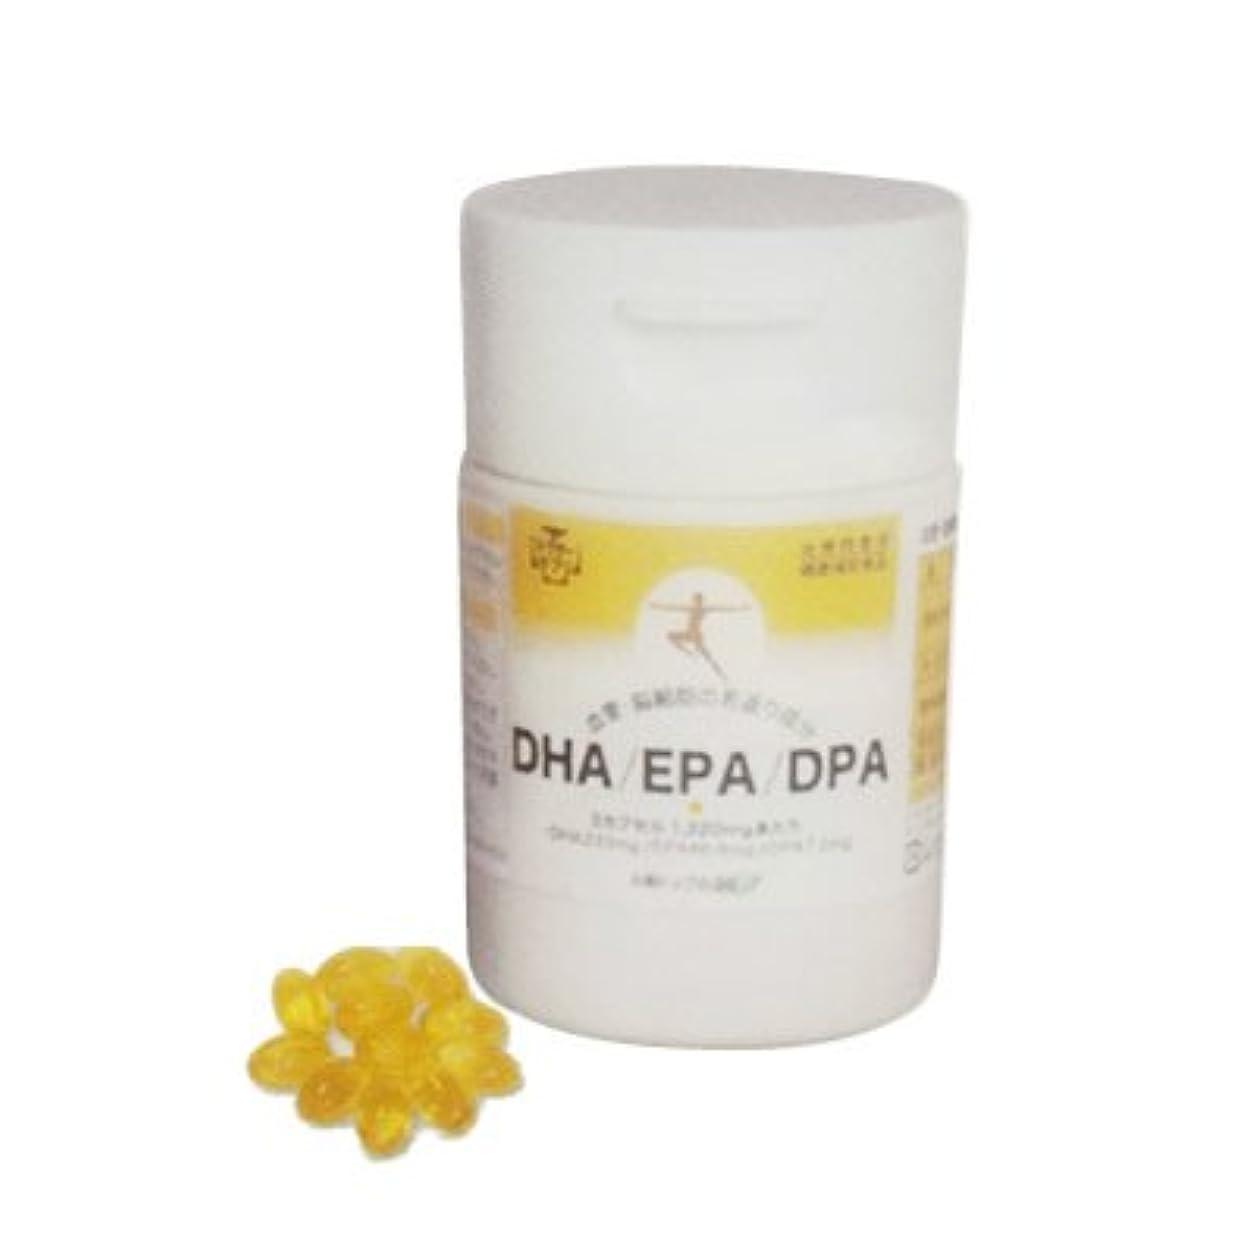 DHA/EPA/DPA 400mg×90カプセル(ドクターサプリ/健康補助食品シリーズ)